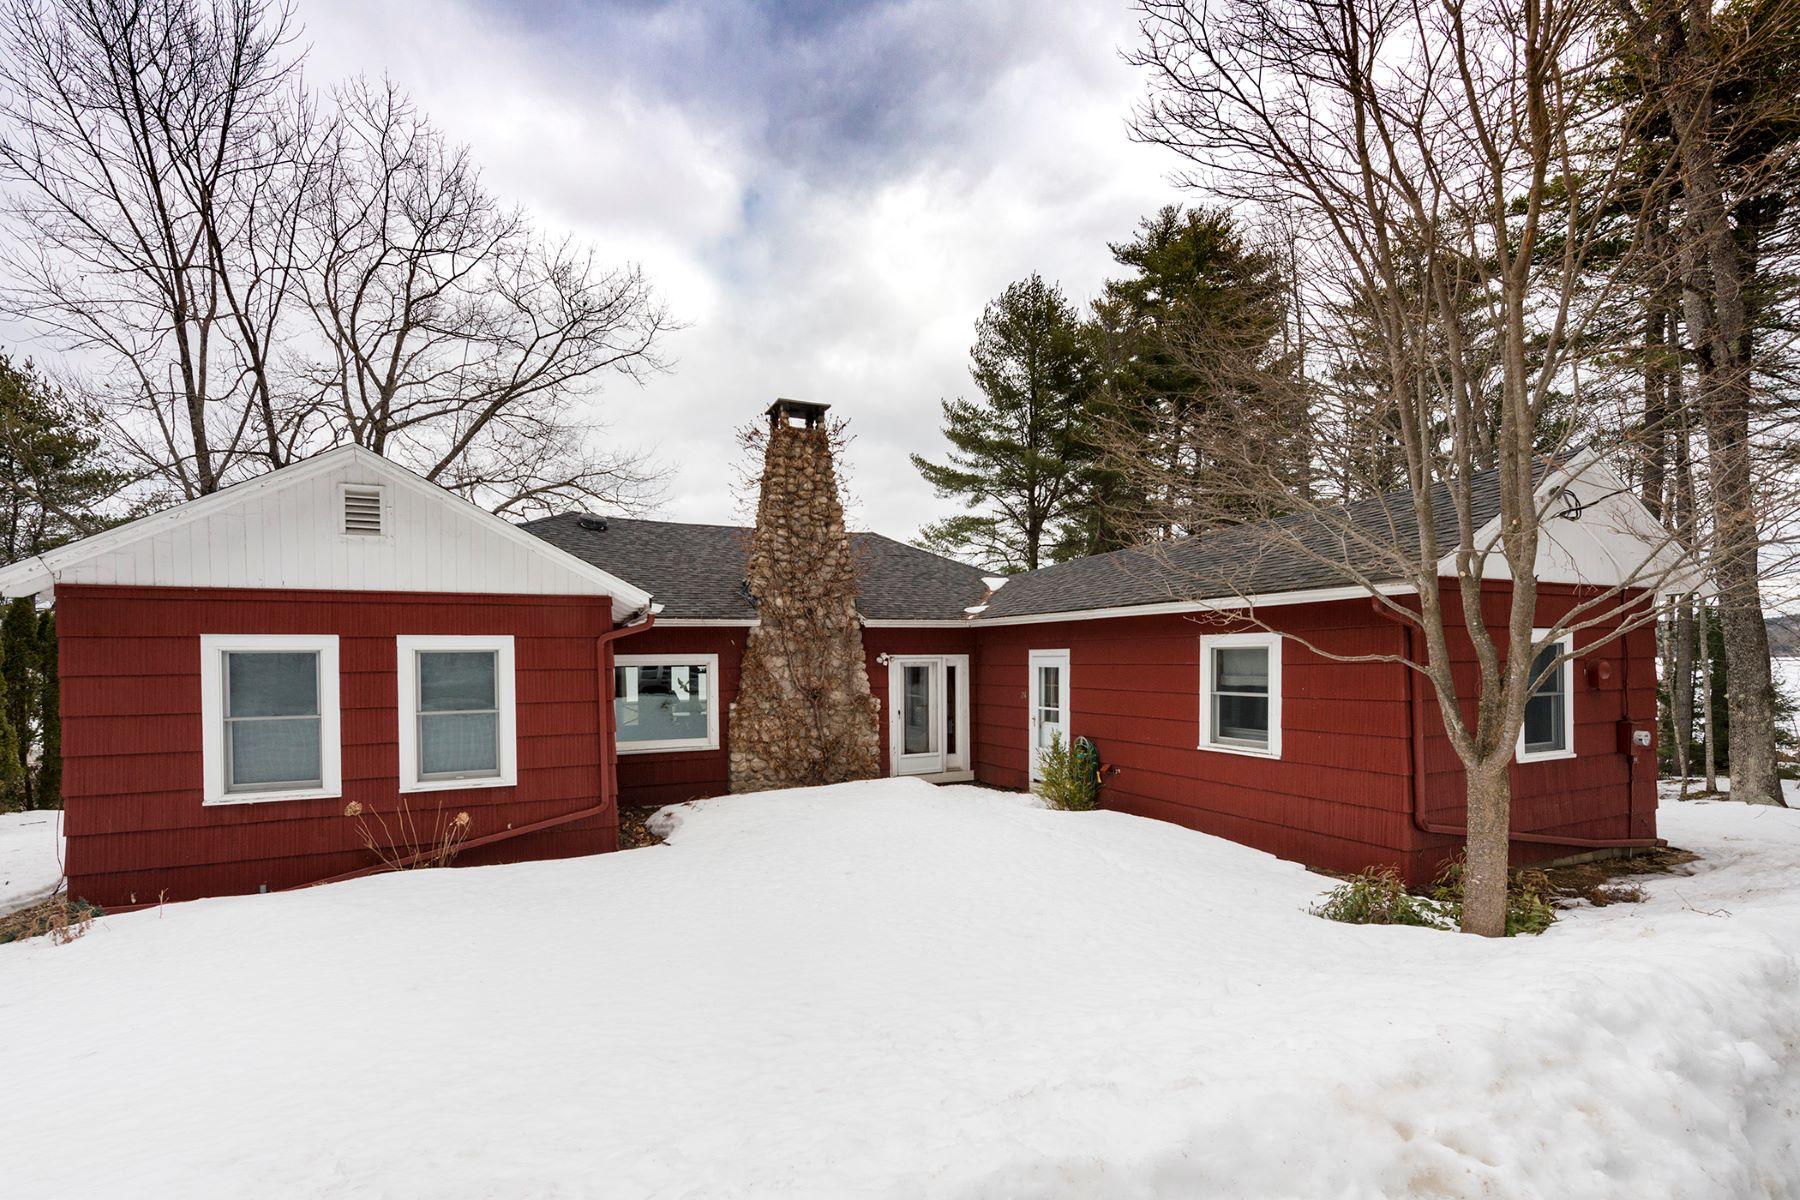 Single Family Home for Sale at 24 Ponderosa Pines 24 Ponderosa Pines Naples, Maine 04055 United States